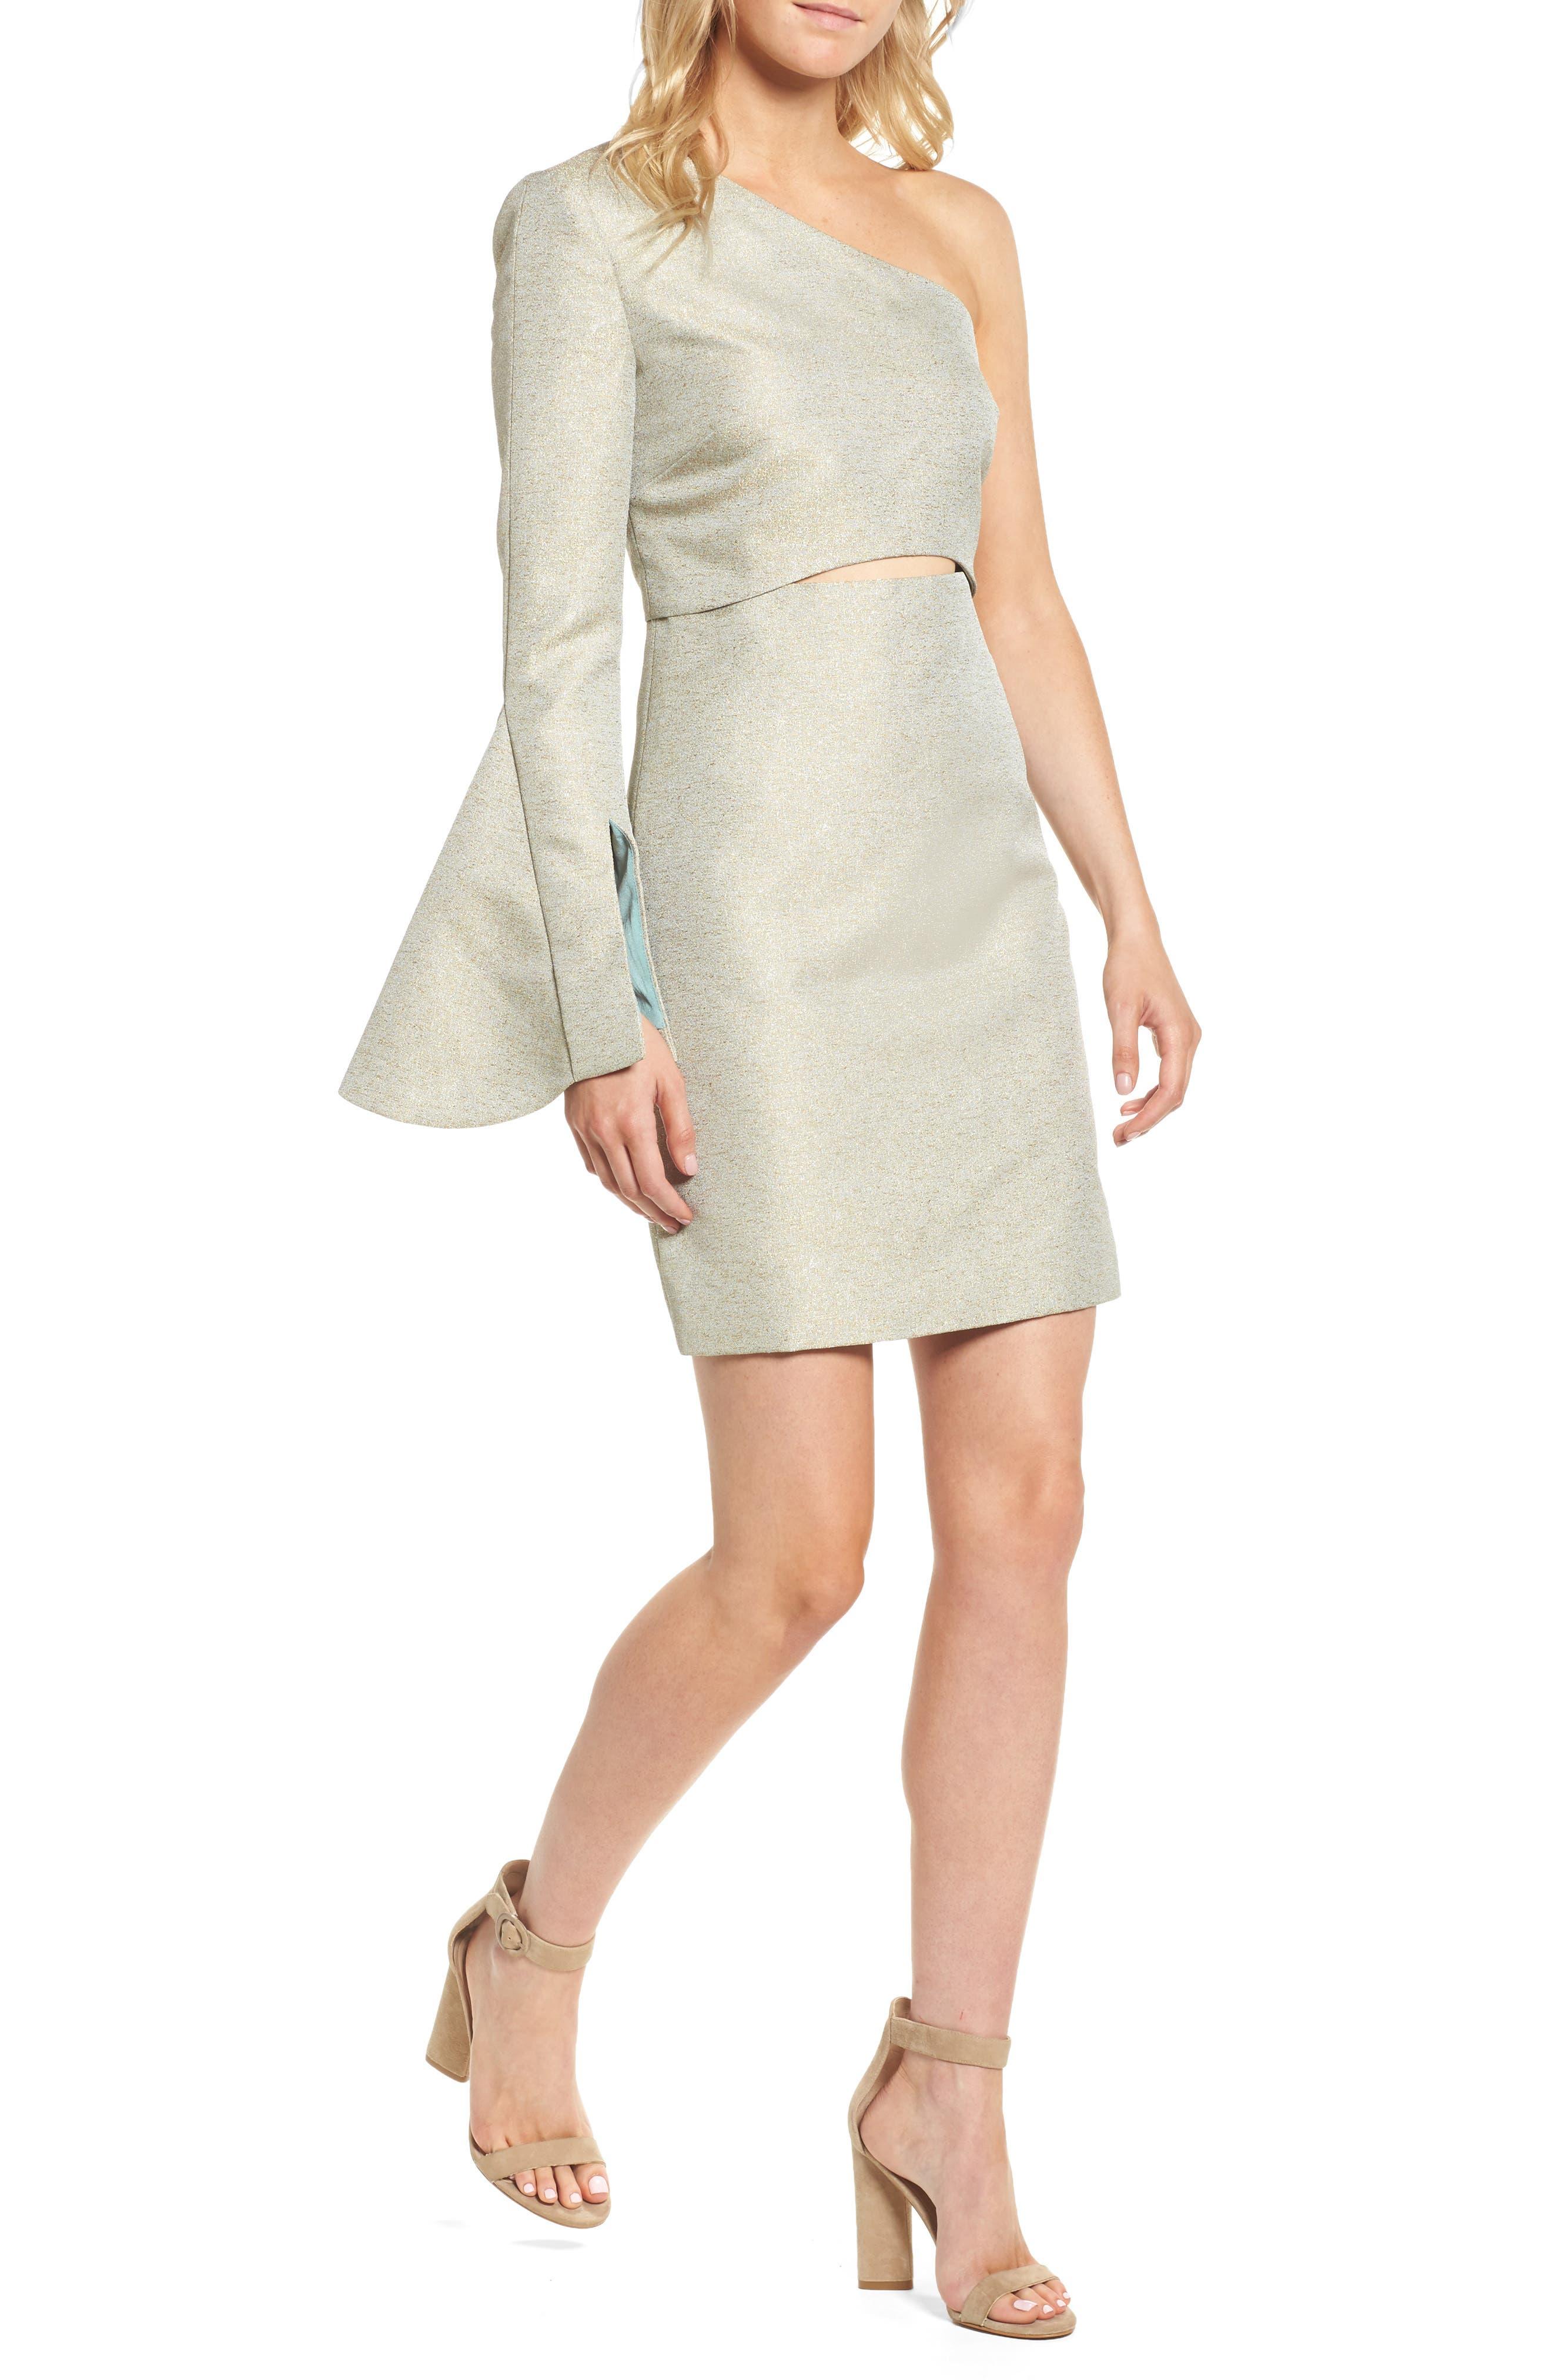 Valencia One-Shoulder Minidress,                             Main thumbnail 1, color,                             Sage